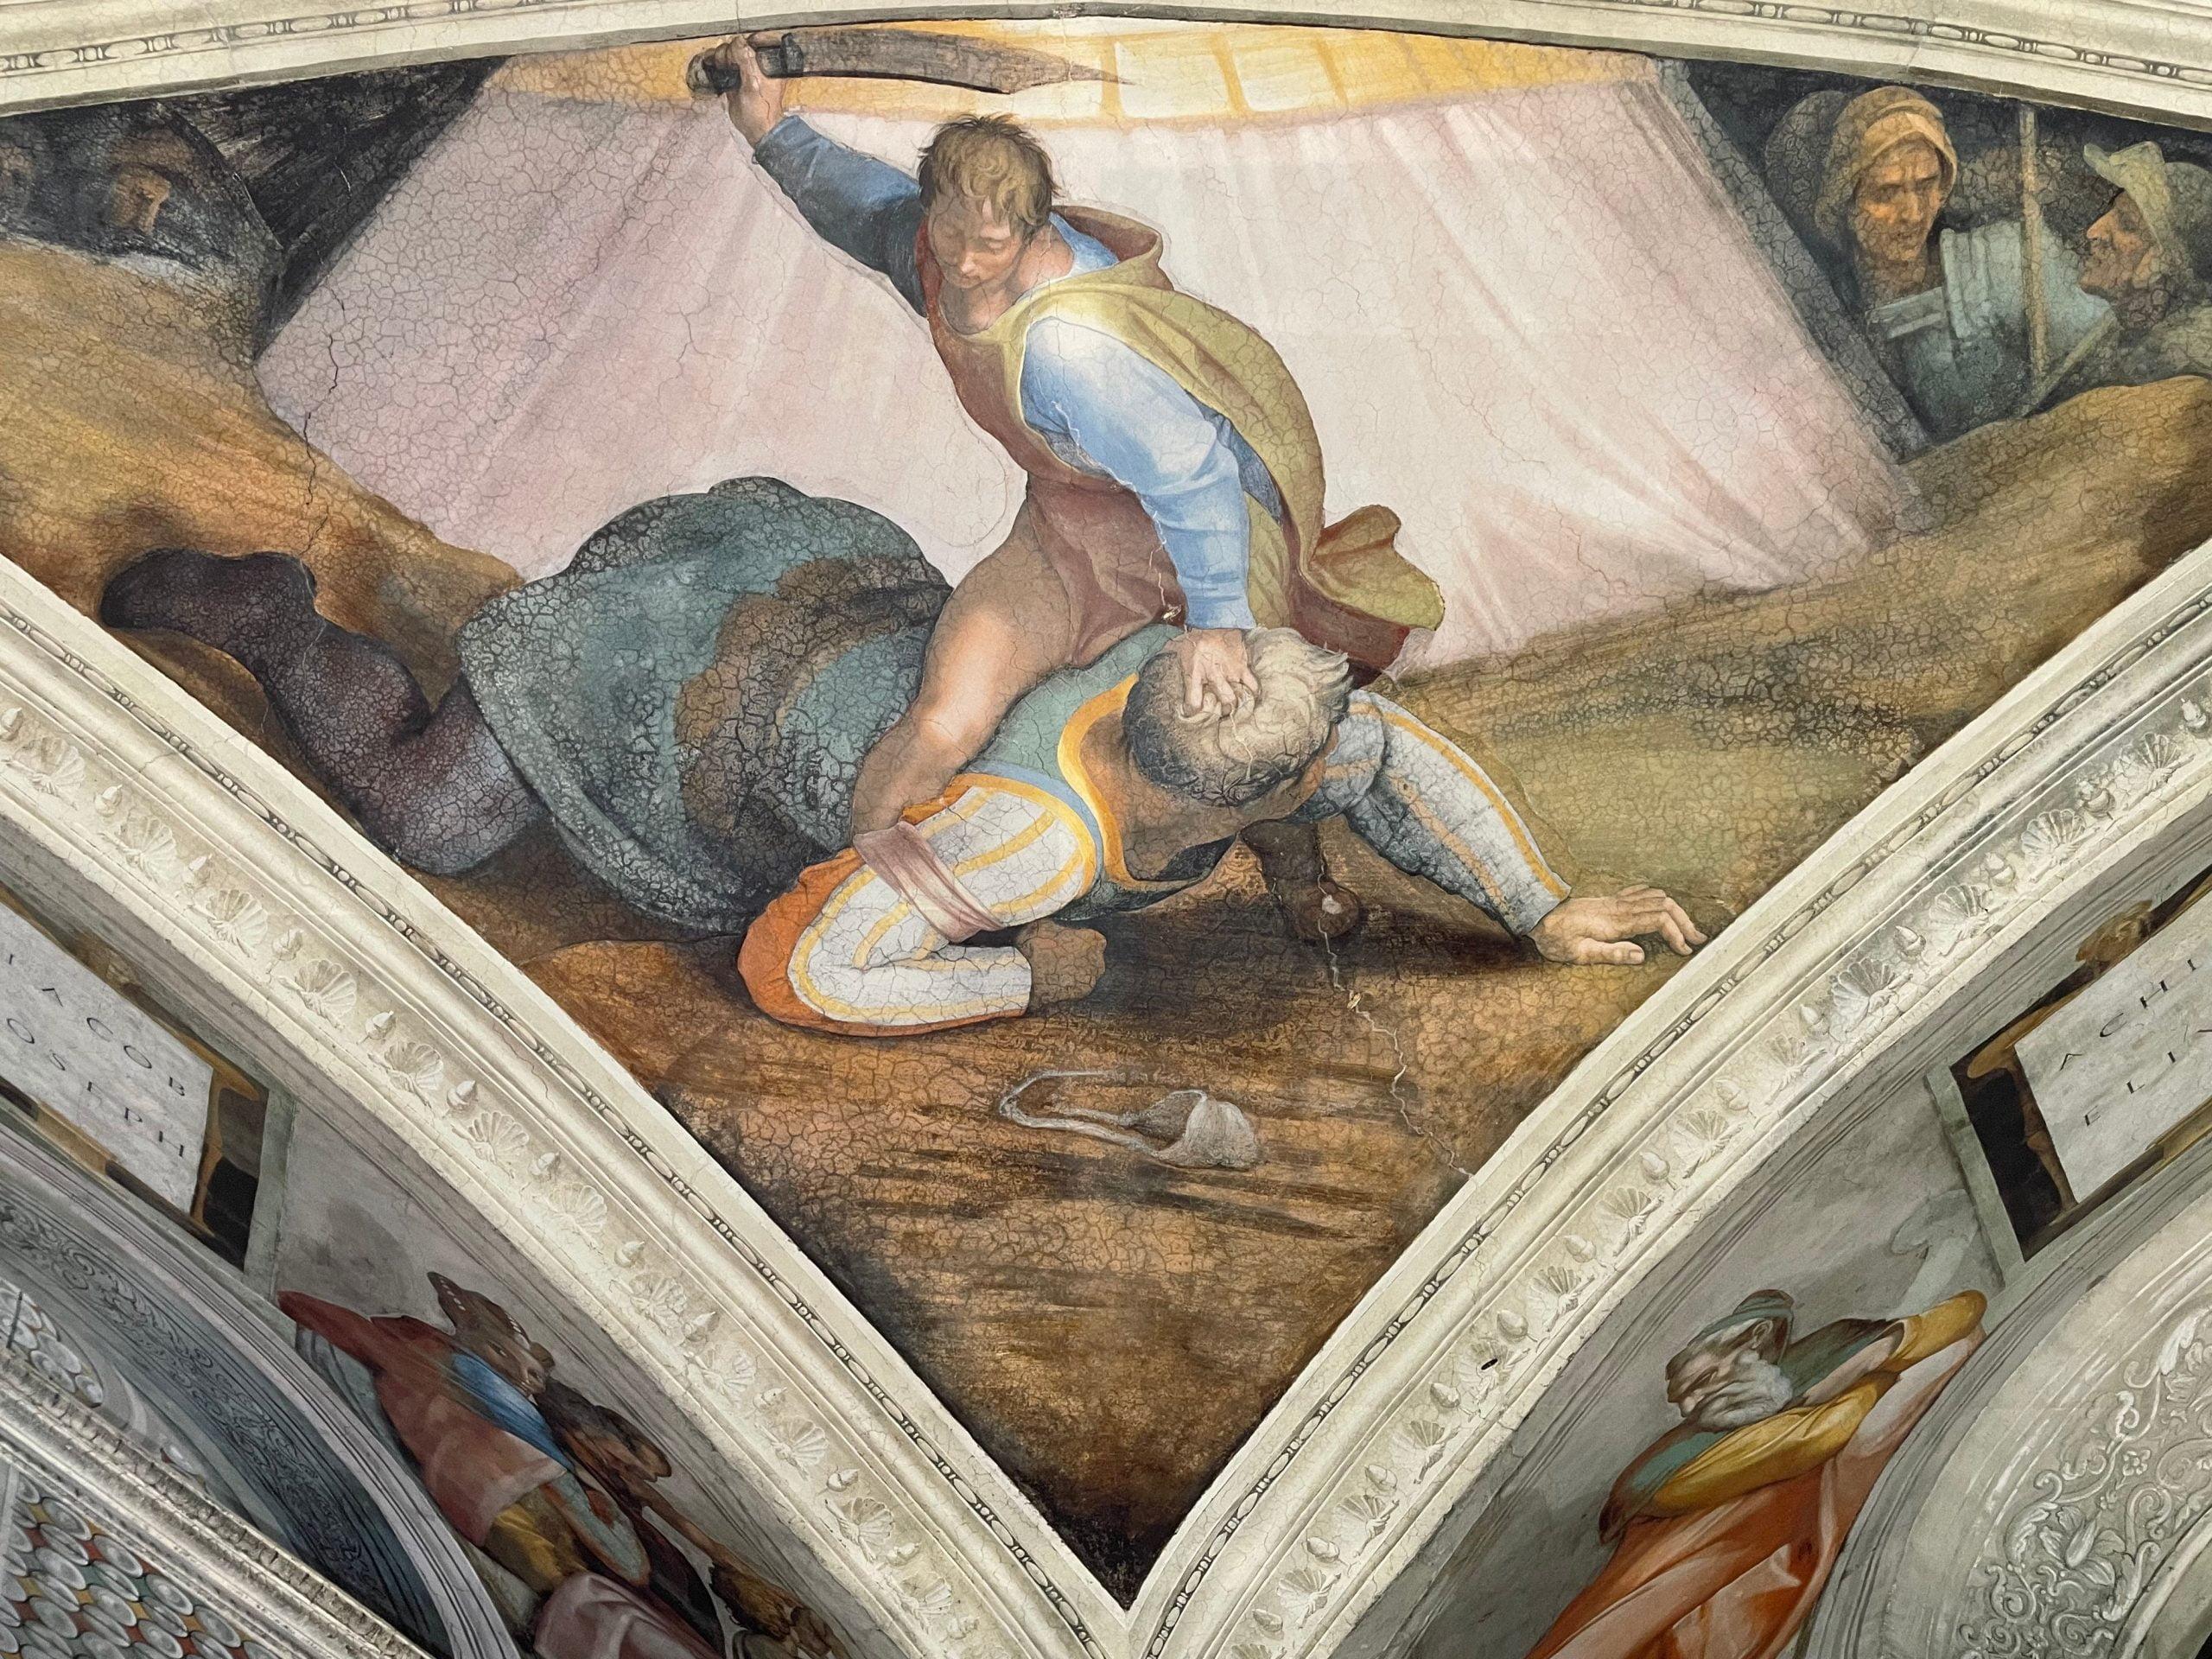 Michelangelo - David and Goliath